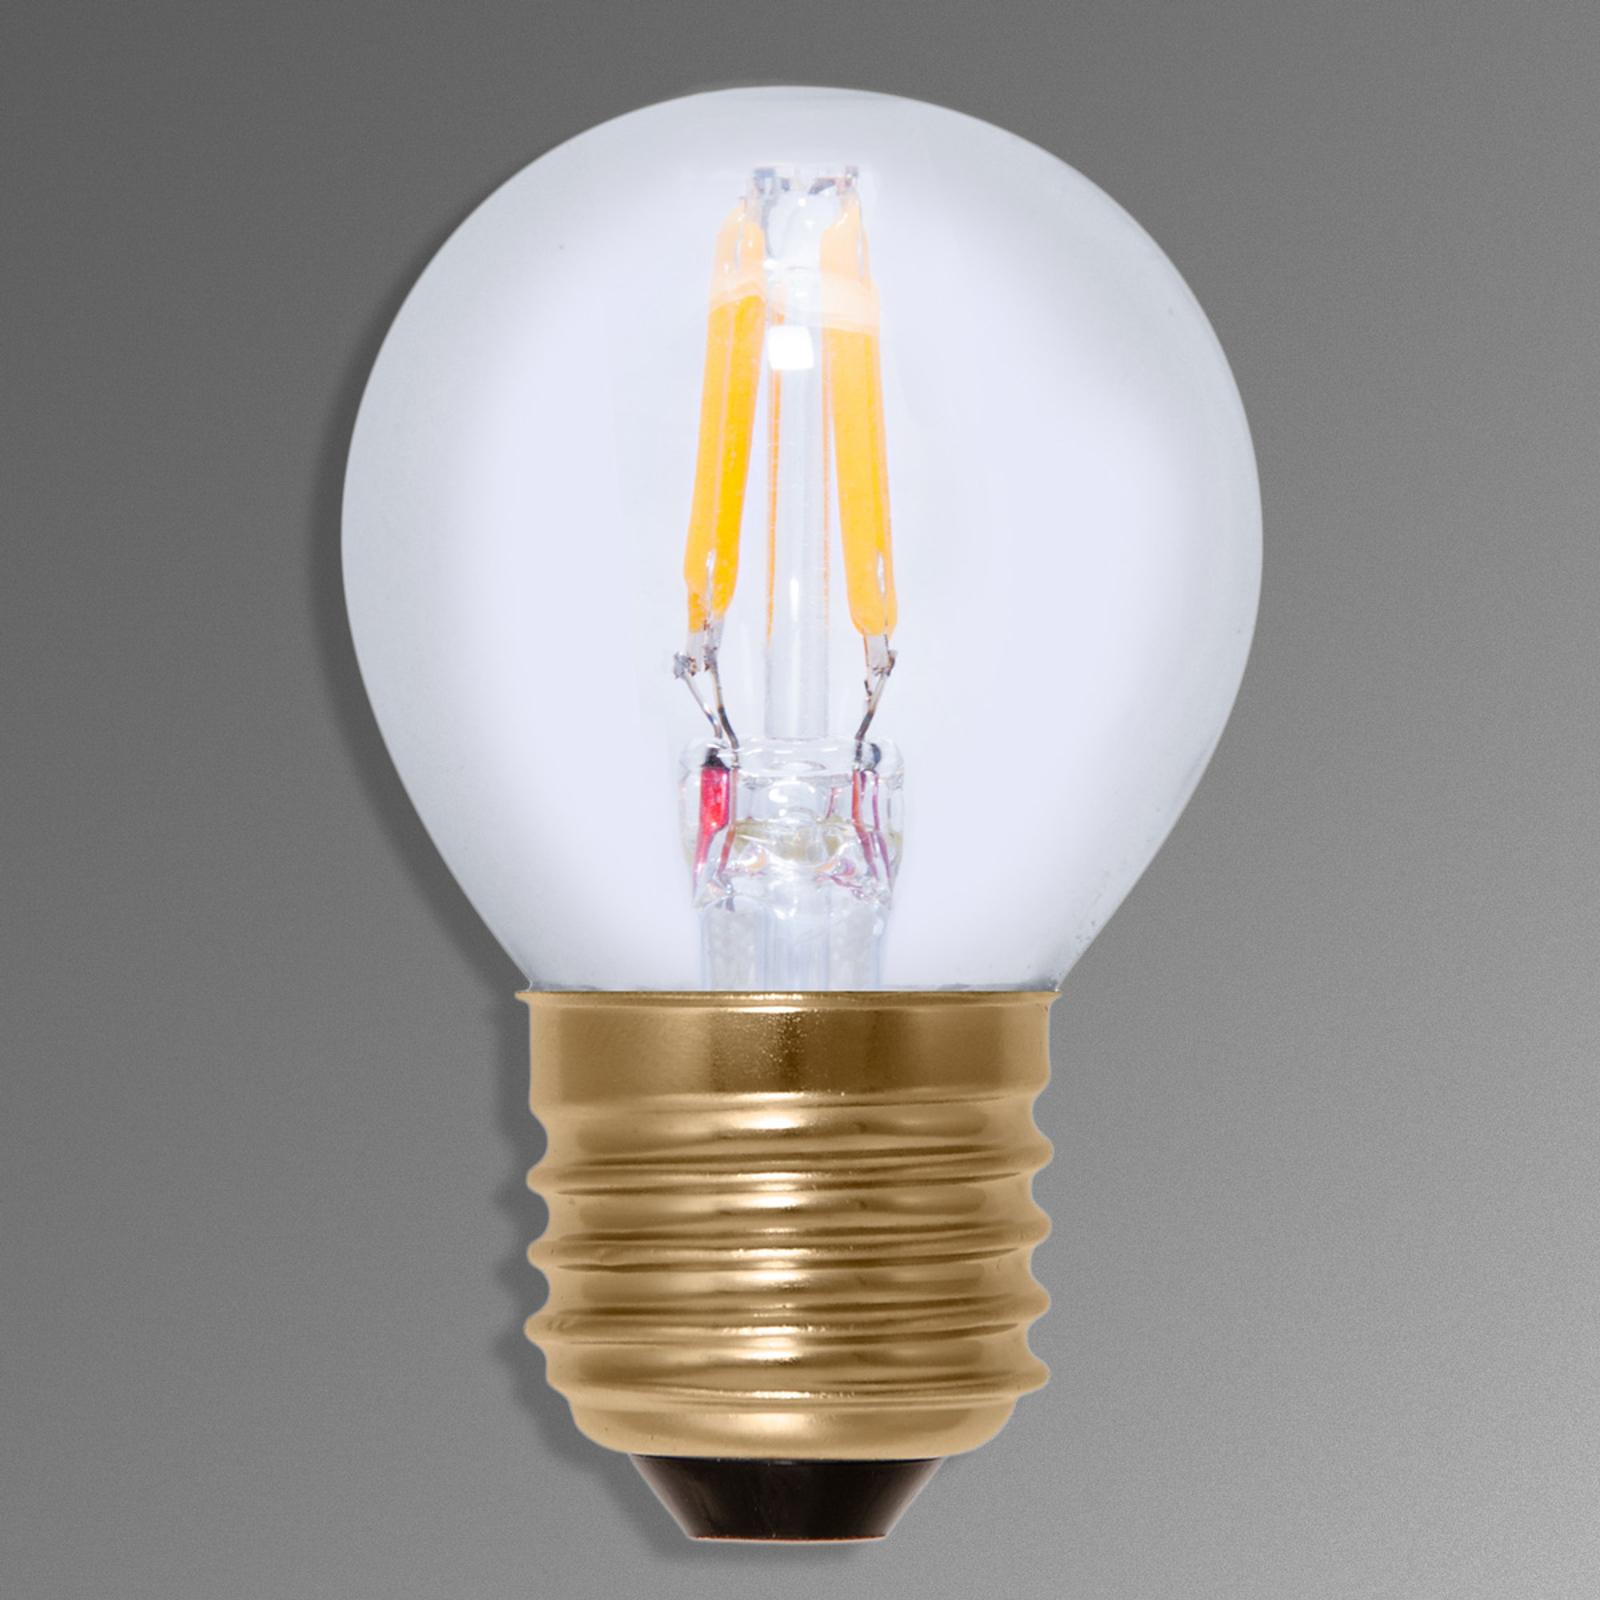 Lampadina a filamenti LED sferica 922 E27 2,7W